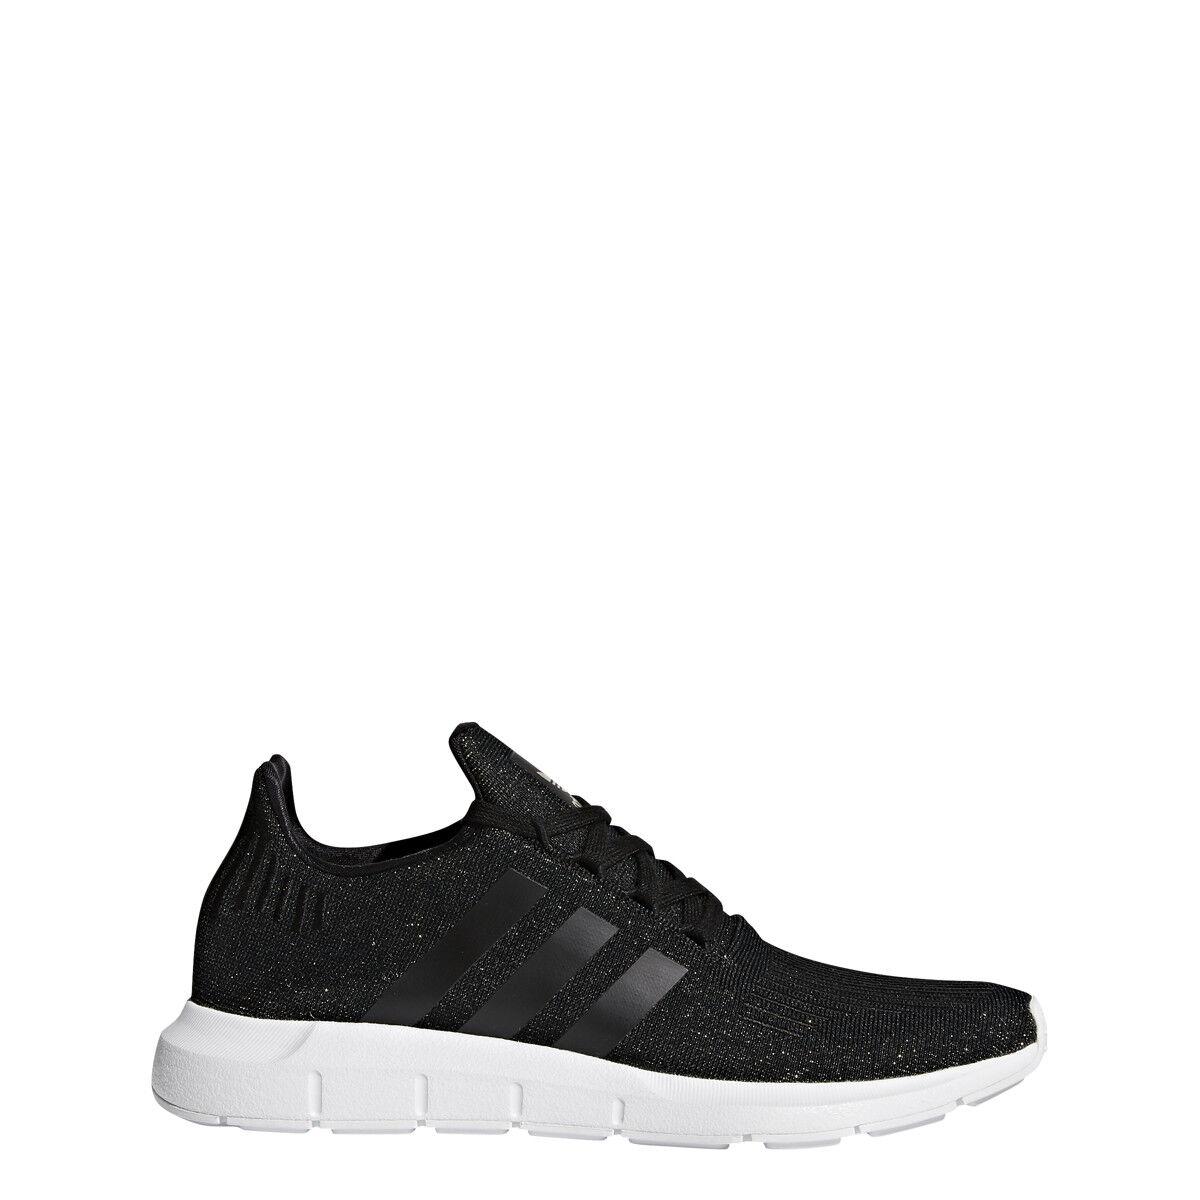 Adidas Swift Run CQ2018 CBLACK,CBLACK,White Womens Size 6.5